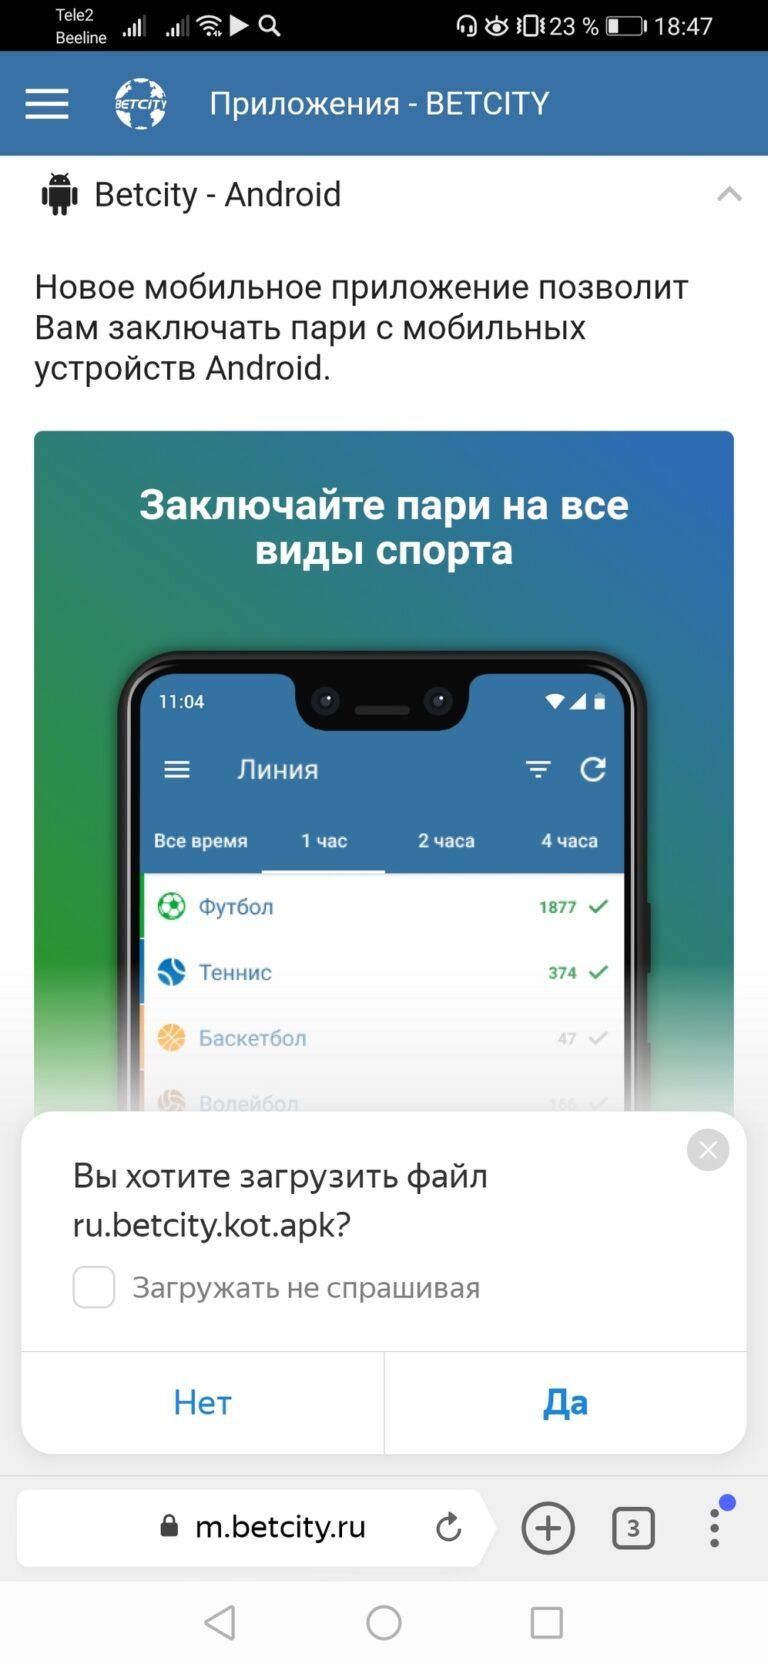 мобильная программа бетсити для ставок